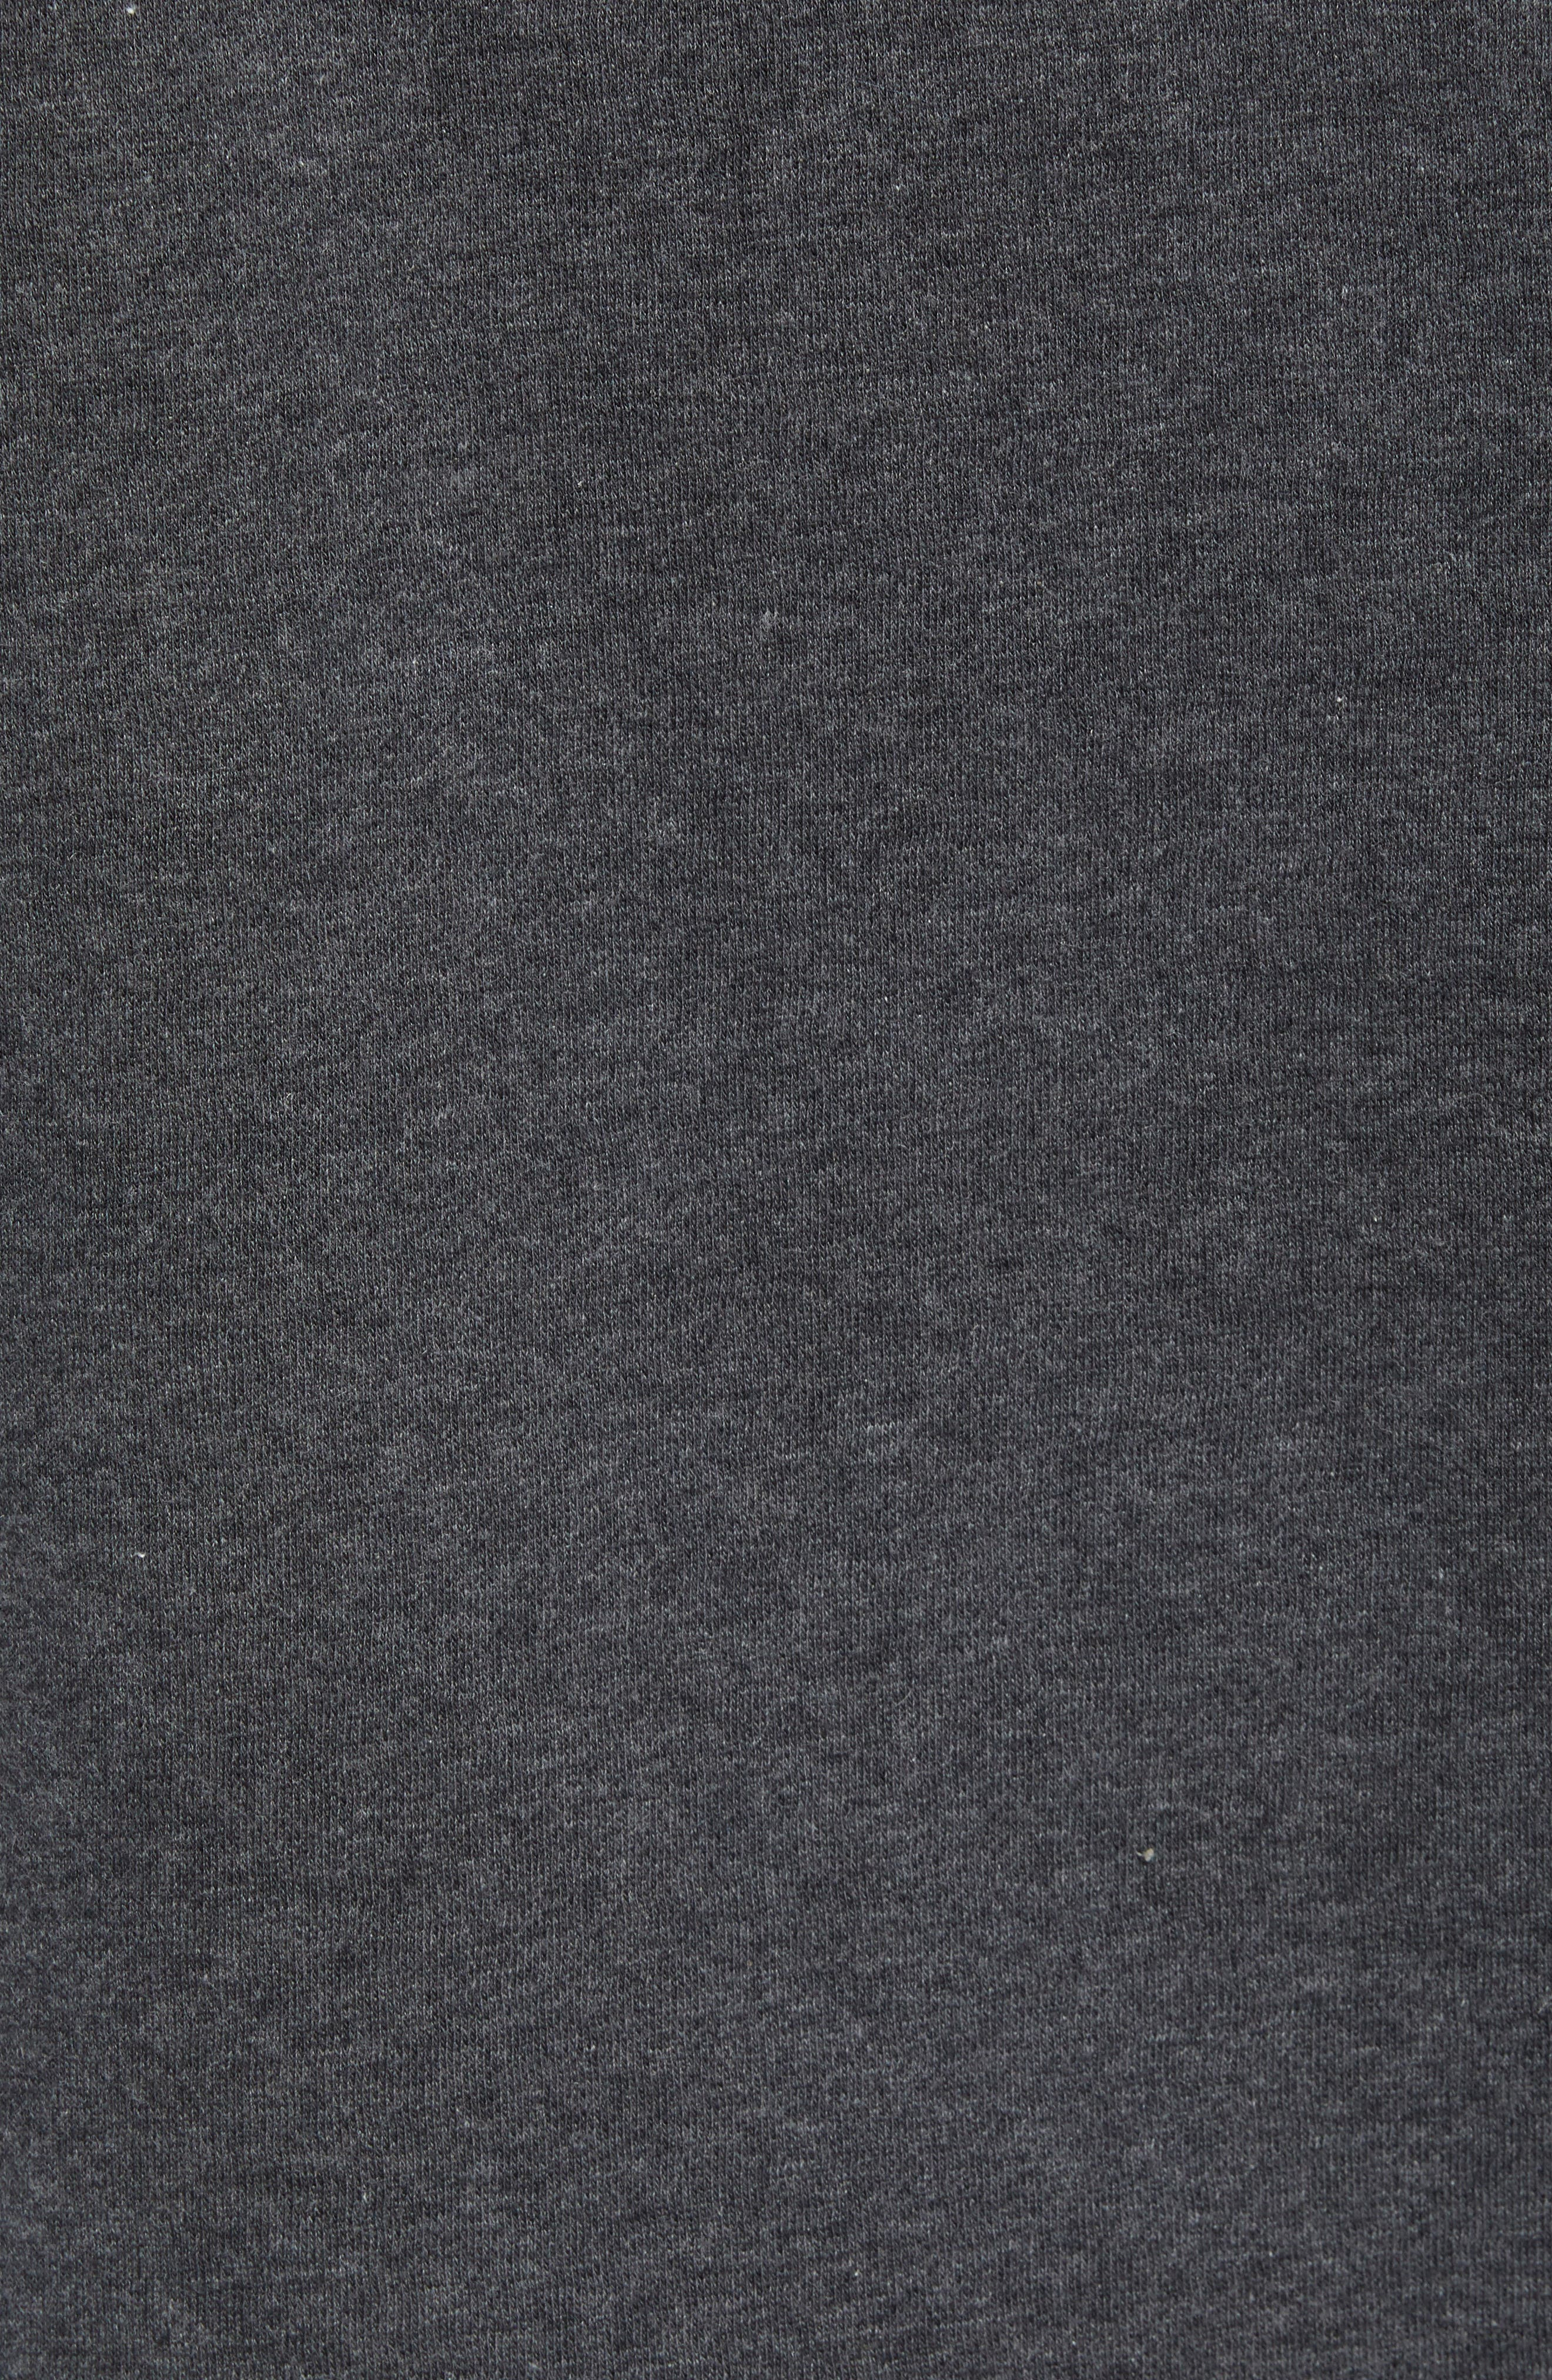 Alphabet City Fleece Pullover,                             Alternate thumbnail 7, color,                             TNF DARK GREY HEATHER